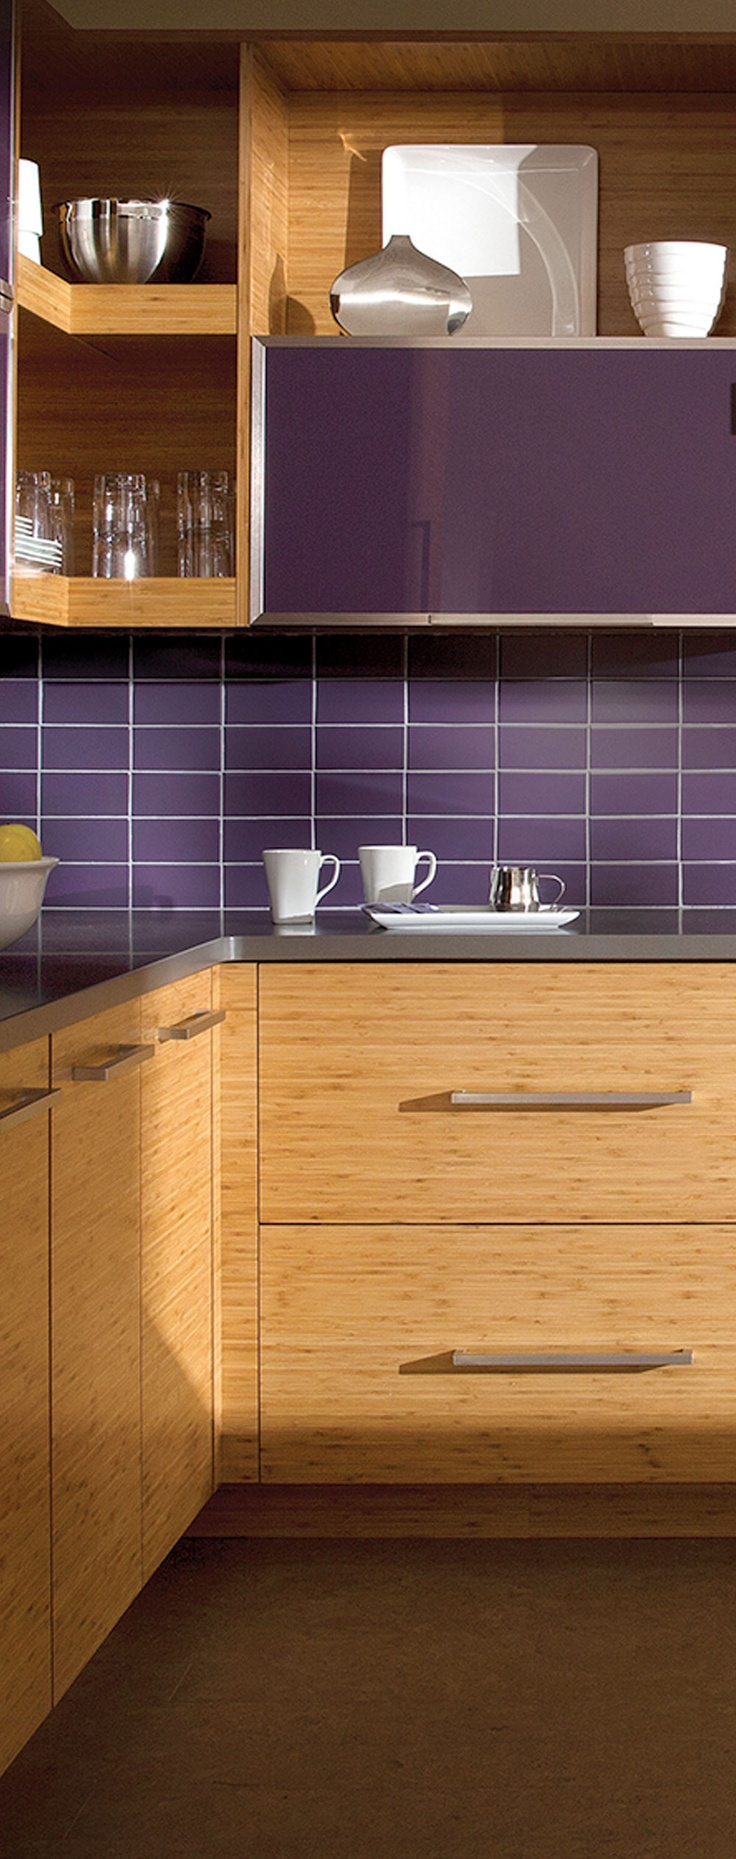 Purple Kitchen Backsplash 17 Best Images About Pretty In Purple On Pinterest Purple